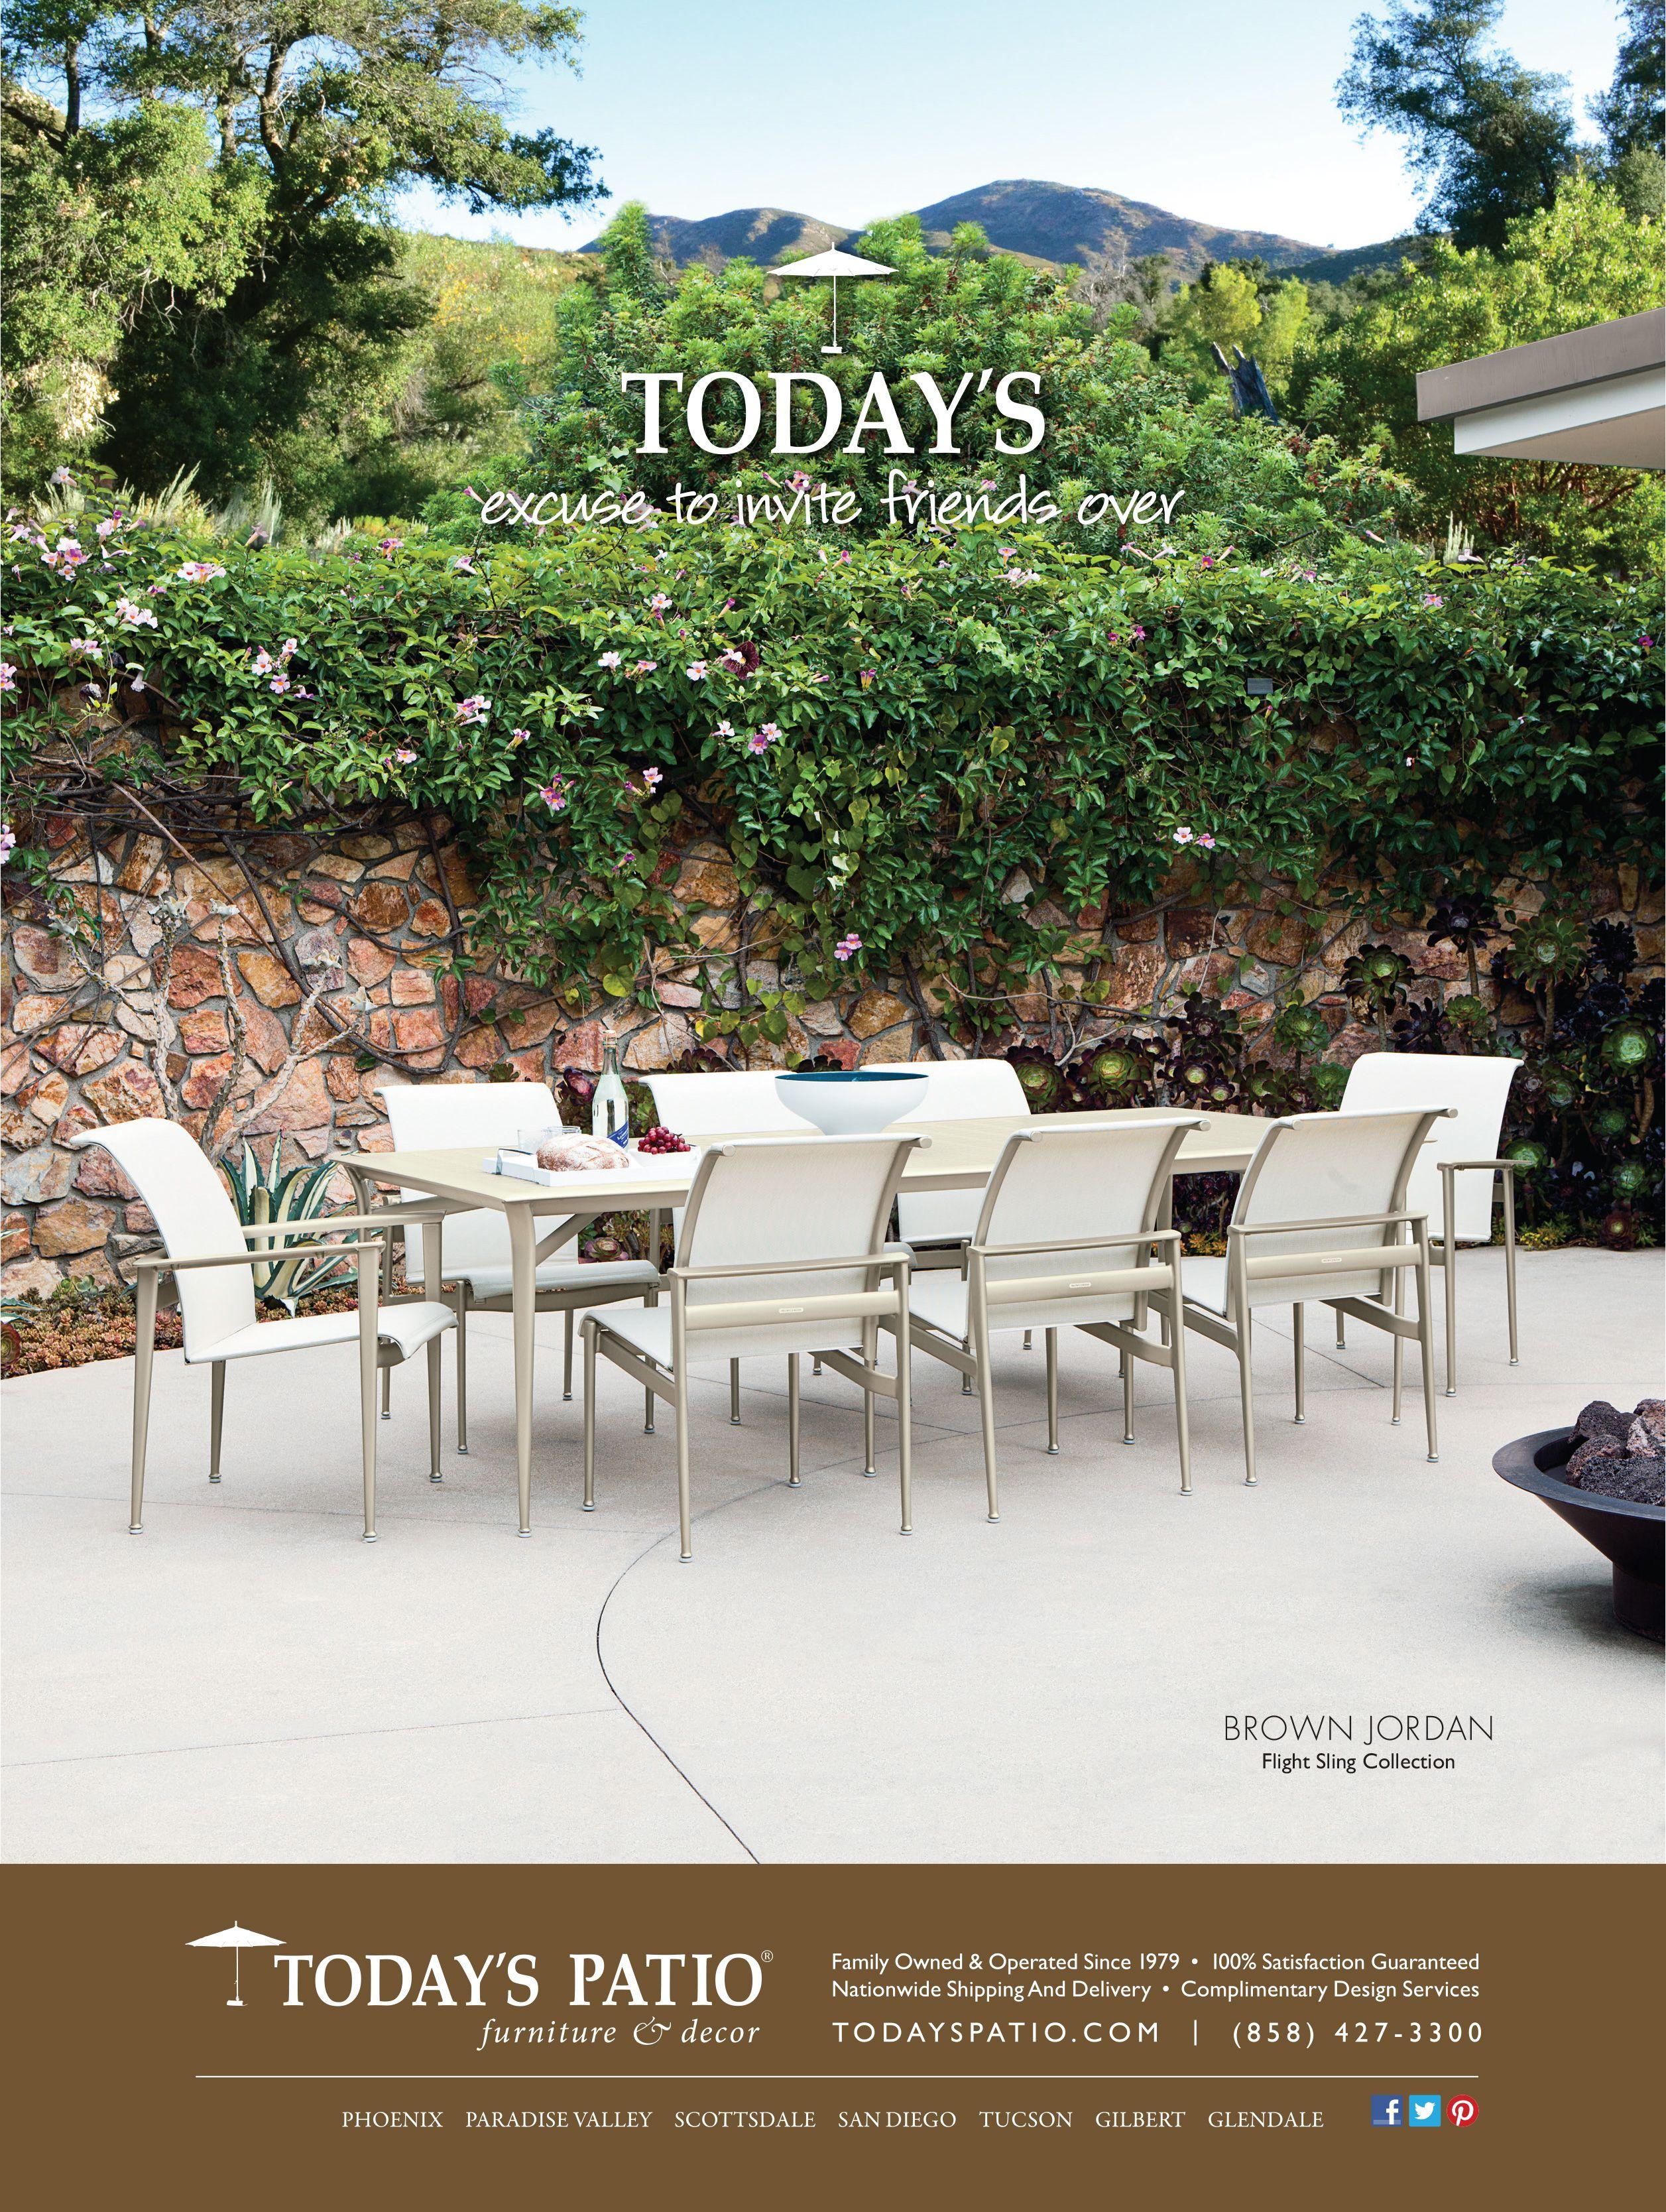 Ratana Patio Set: Today's Patio Furniture Scottsdale